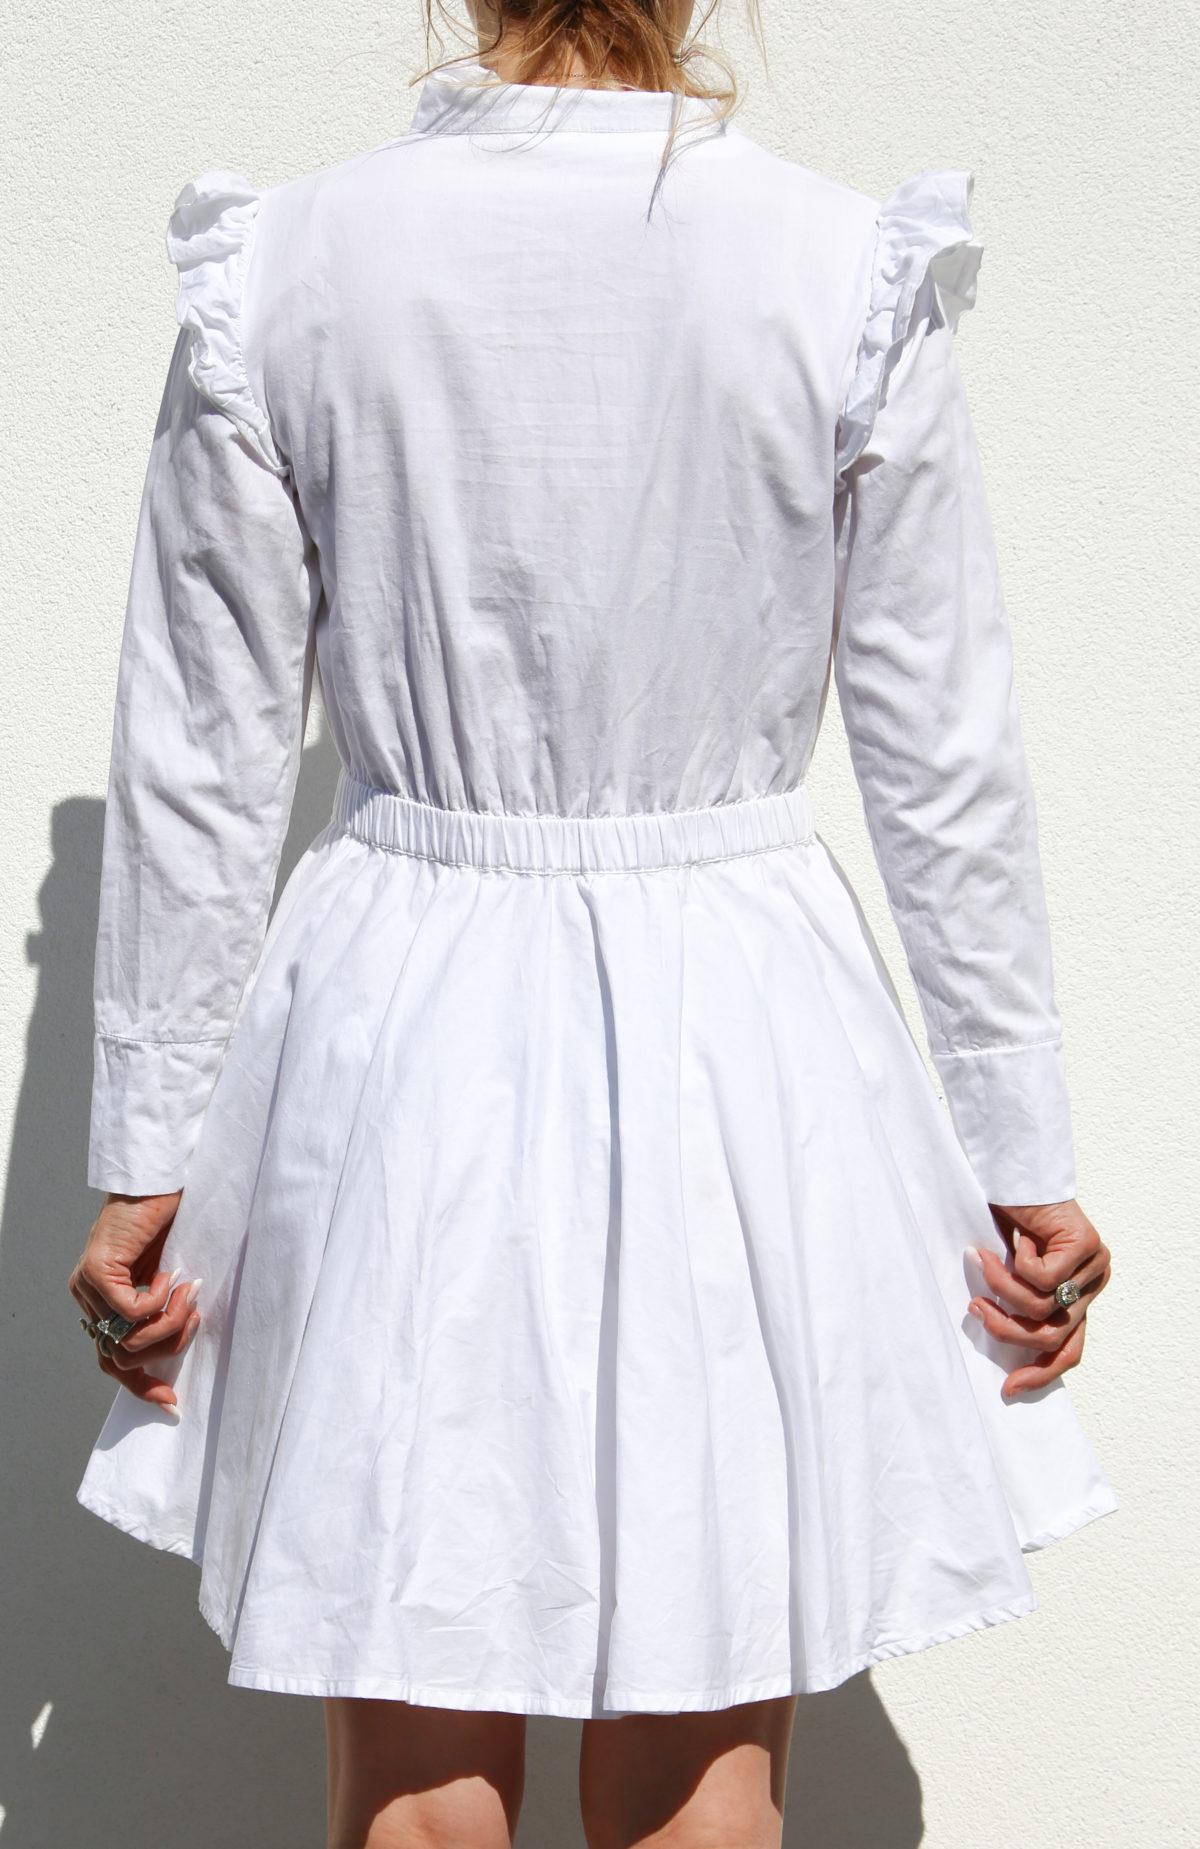 Camilla Stenberg Line Dress | FINN.no